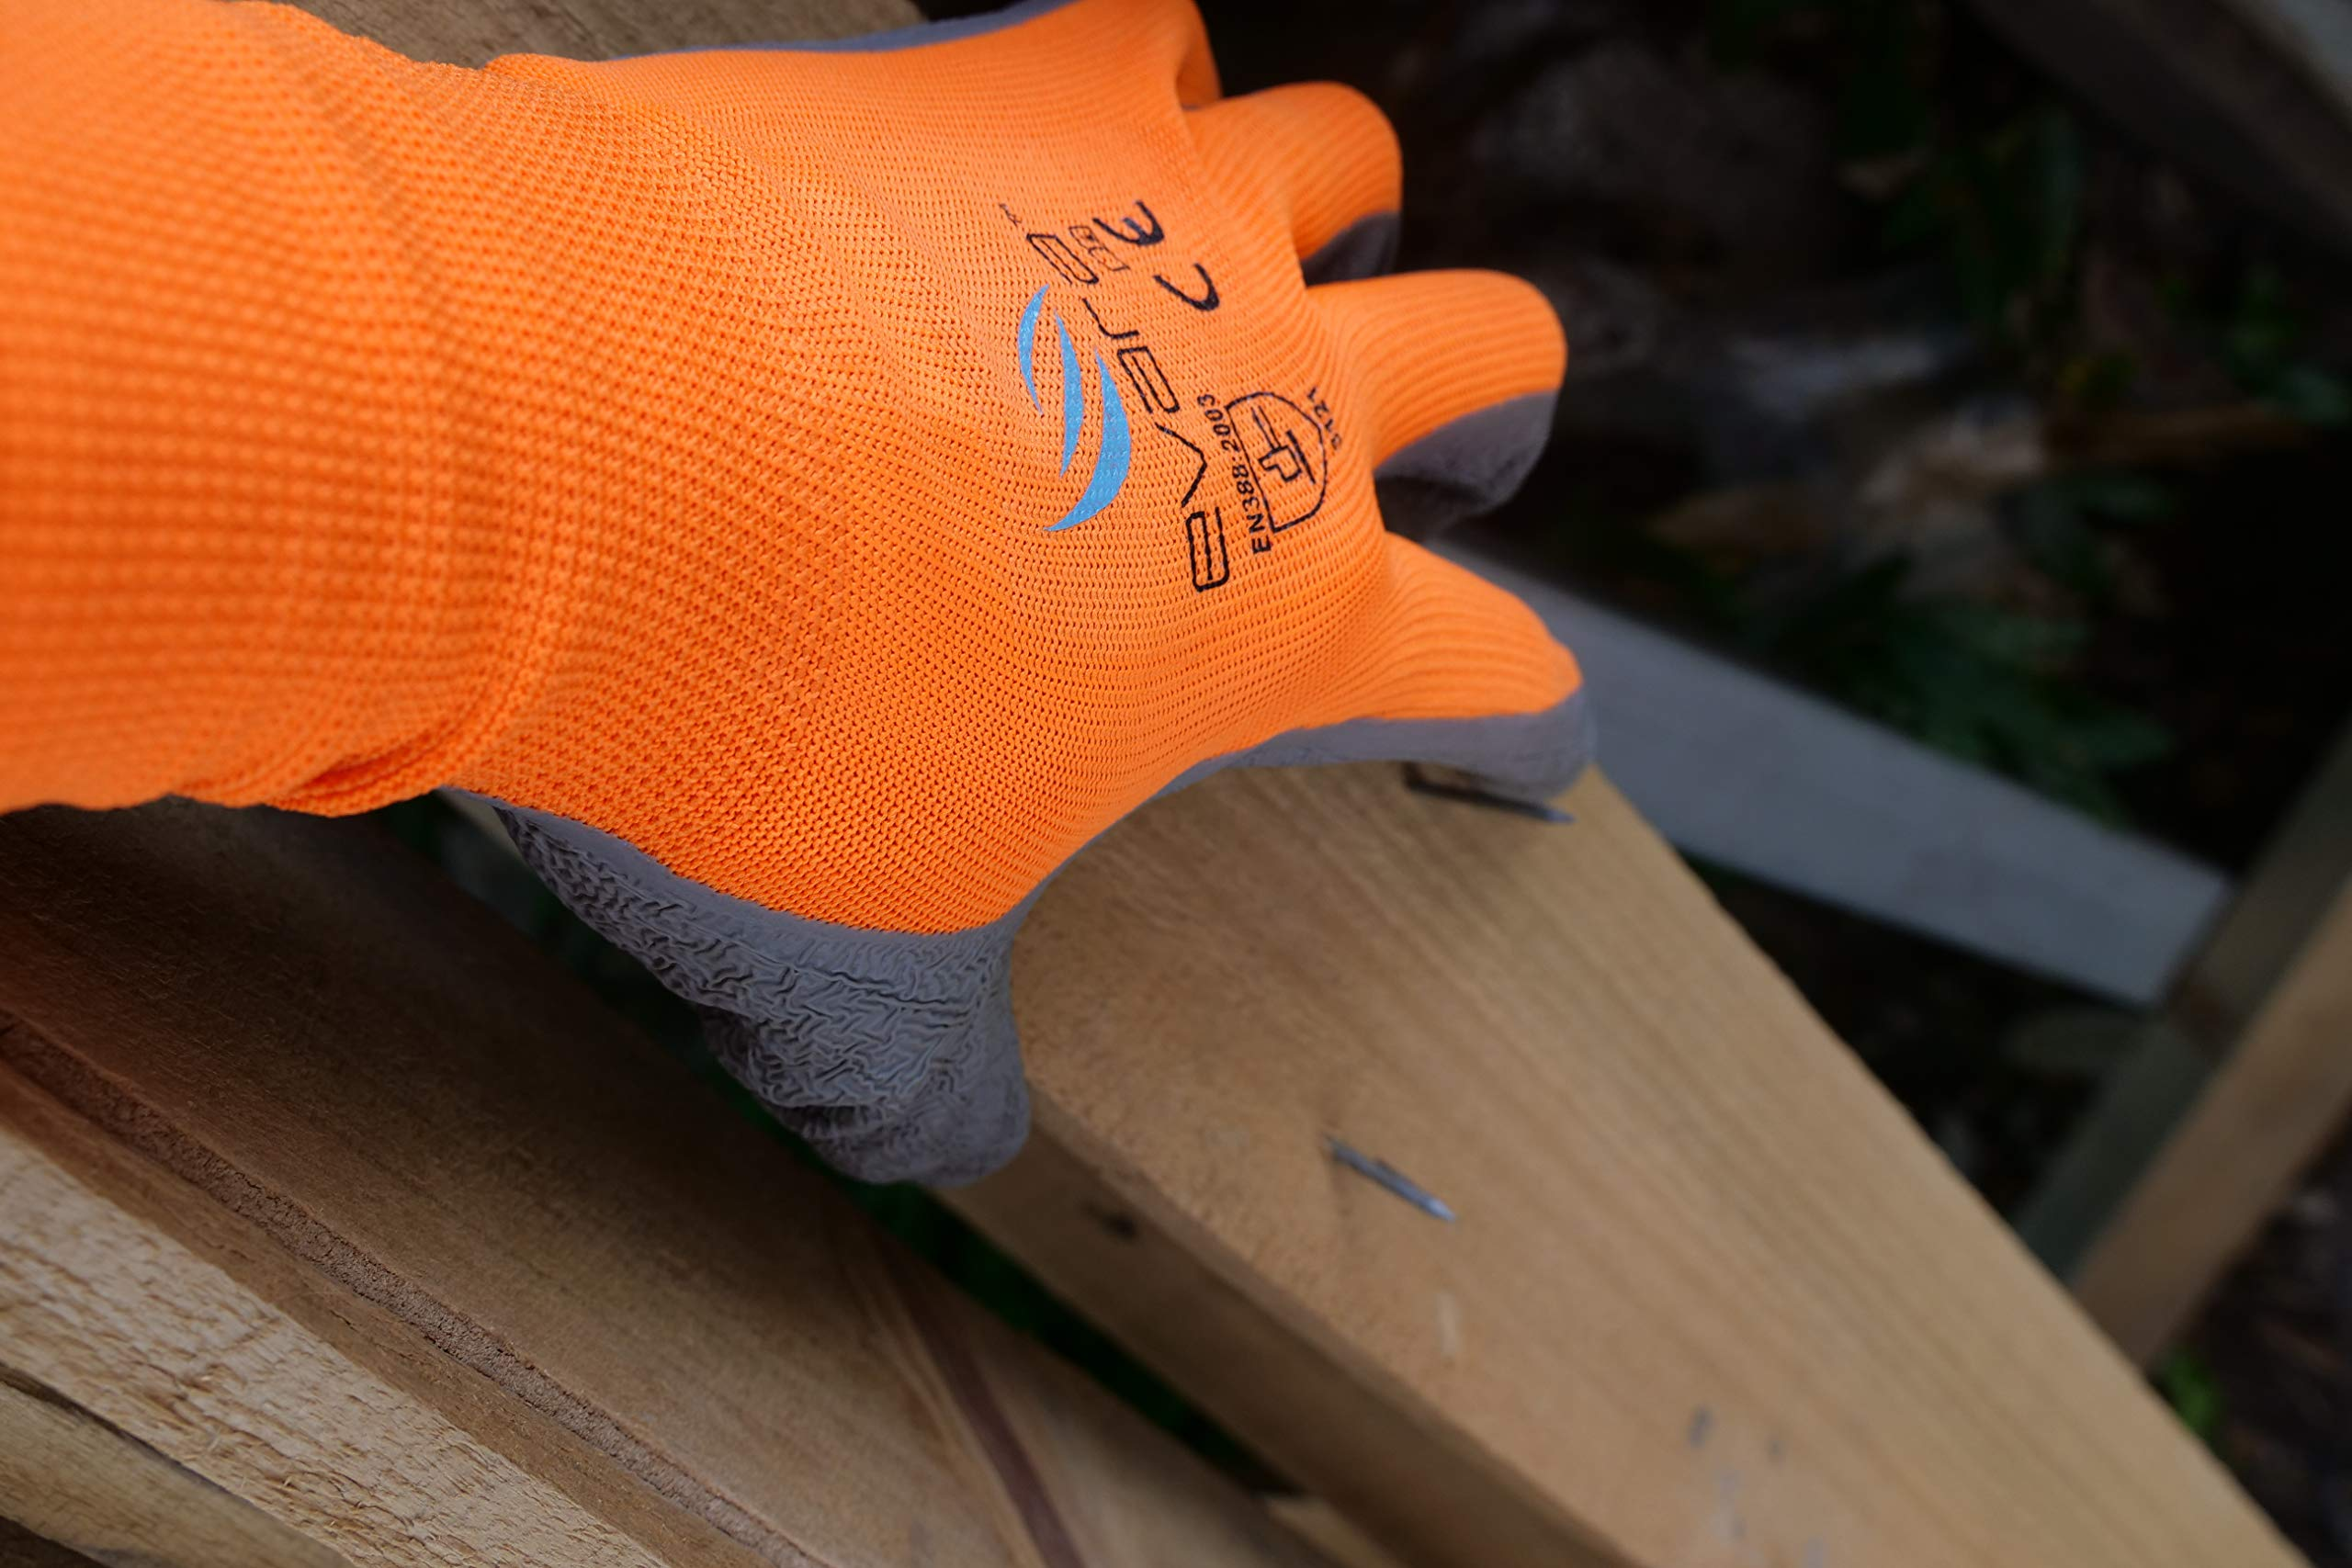 Tough Work and Gardening Gloves for Men and Women(12 pairs per pack) (Latex, Medium) Supreme Hi-vis orange with full thumb dipping by Evara by Evara (Image #5)